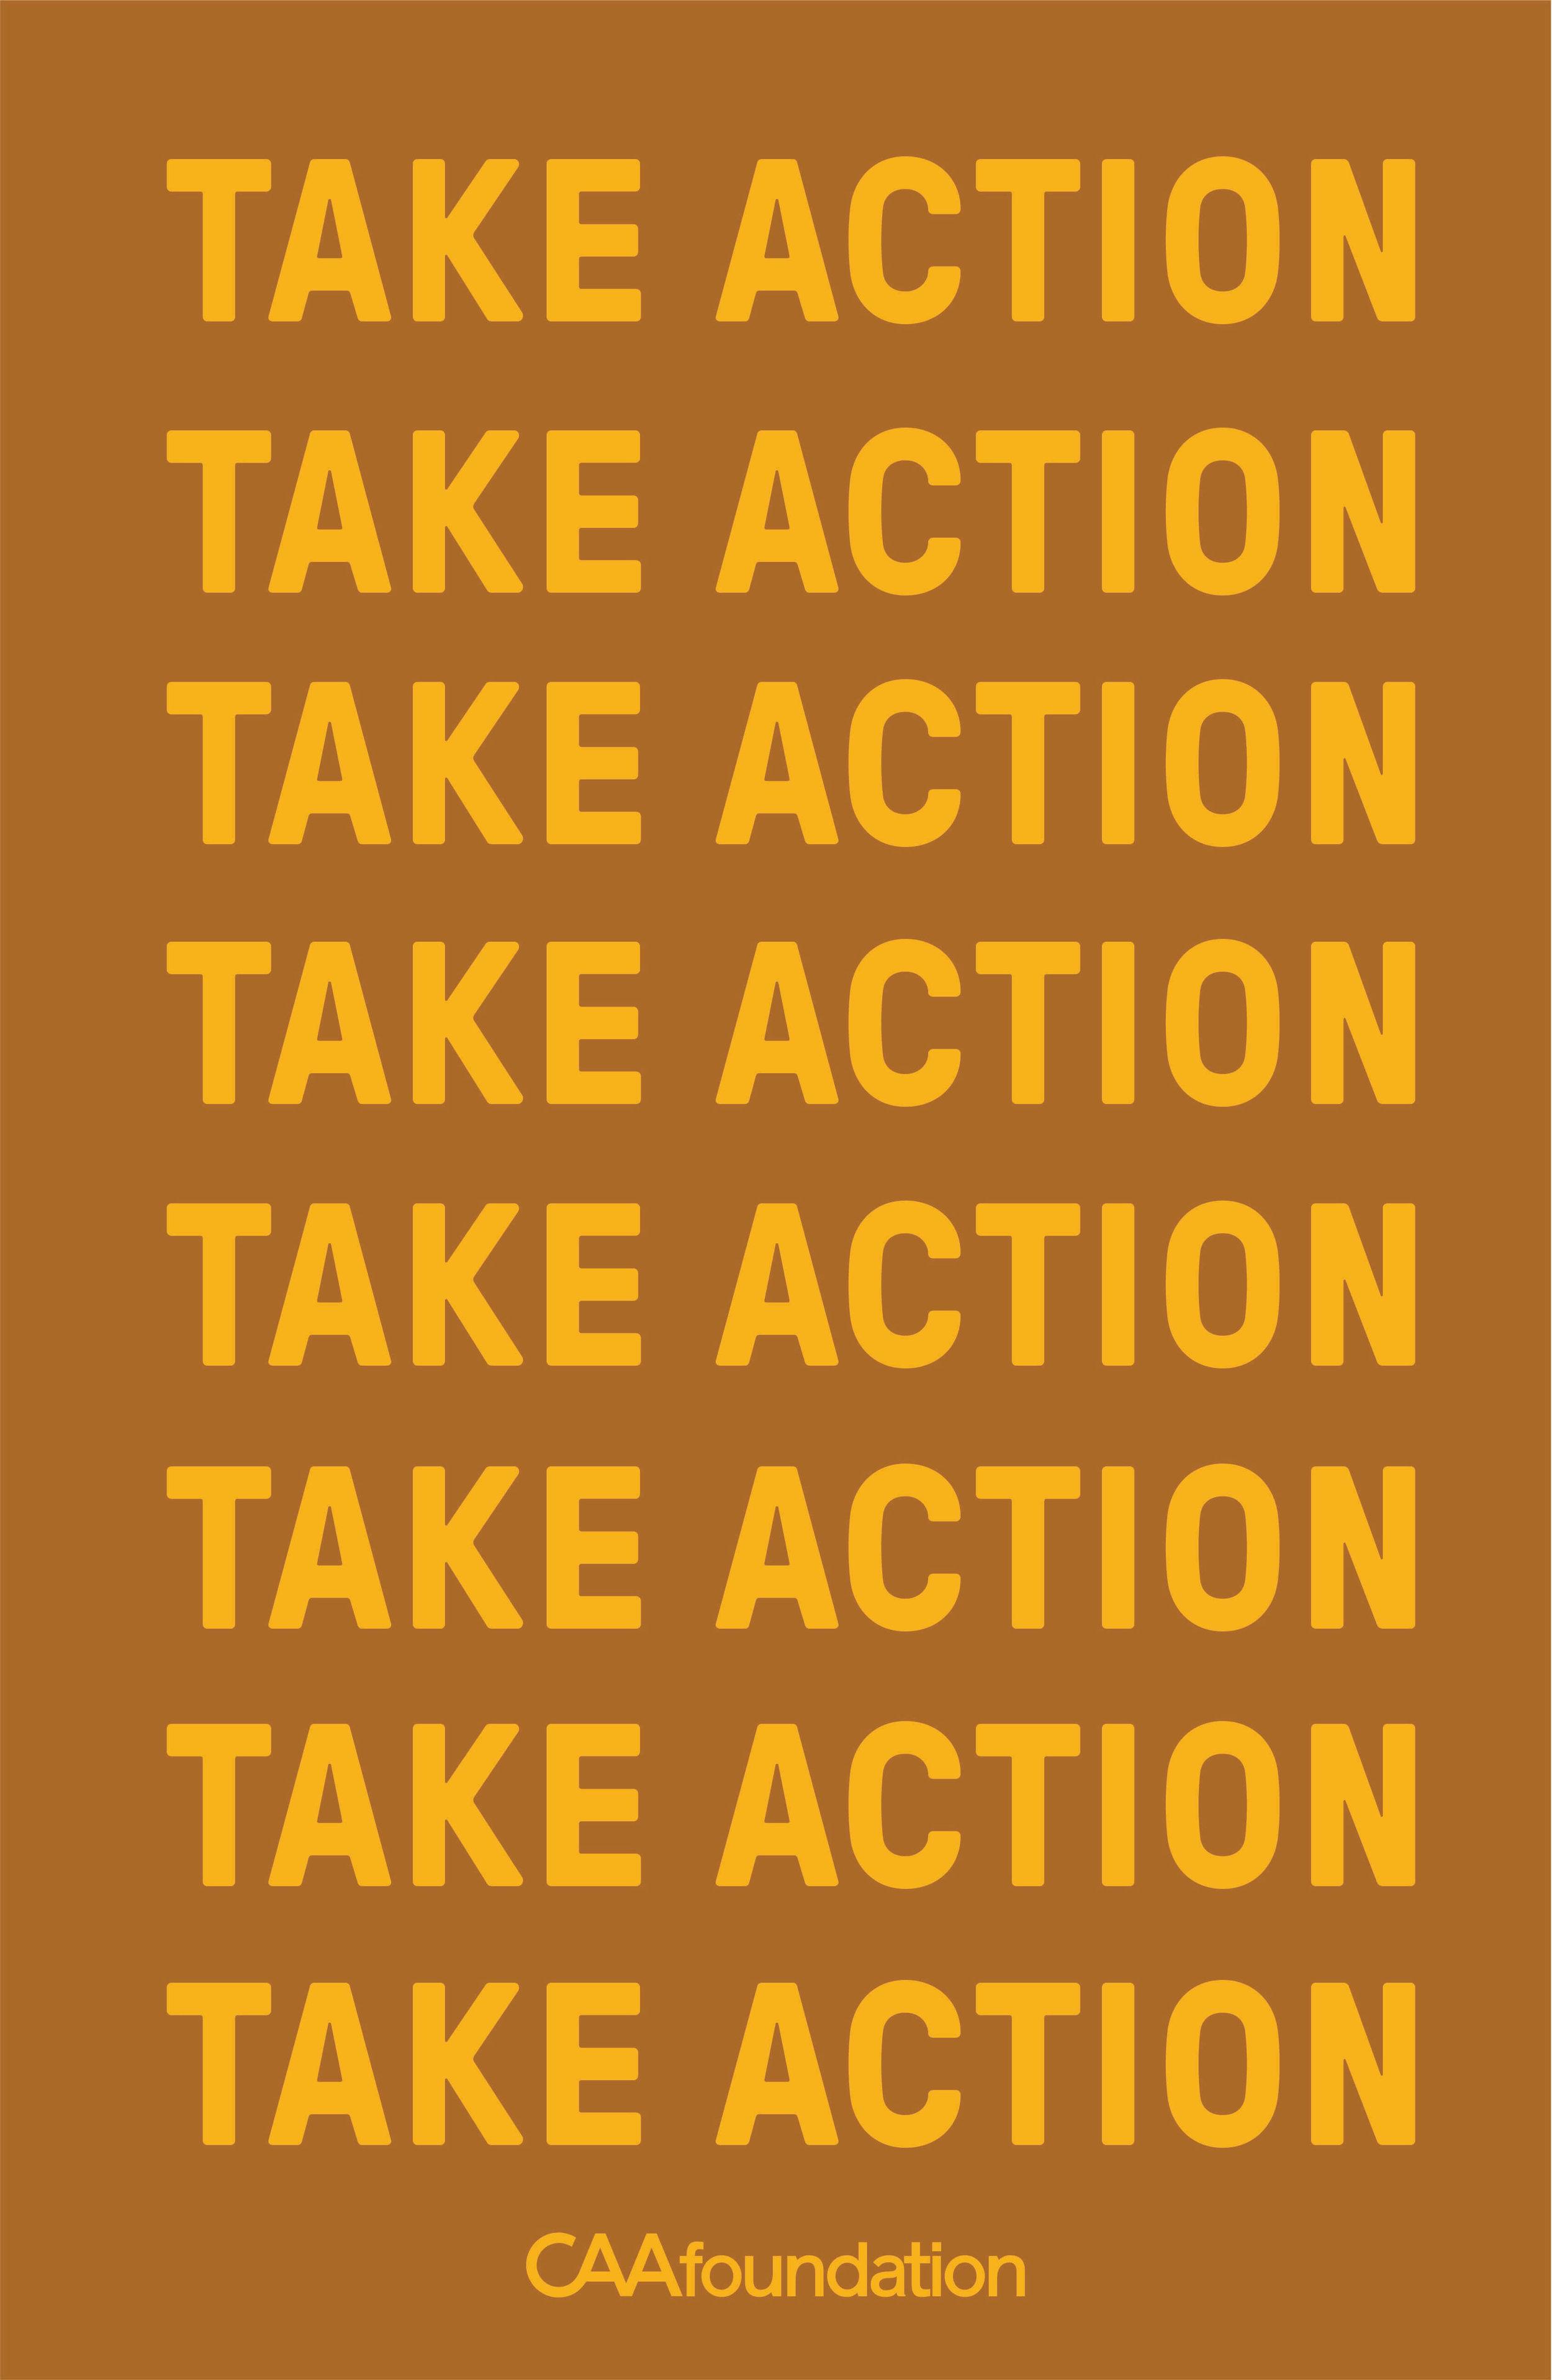 Take_Action_Posters_v5-20.jpg